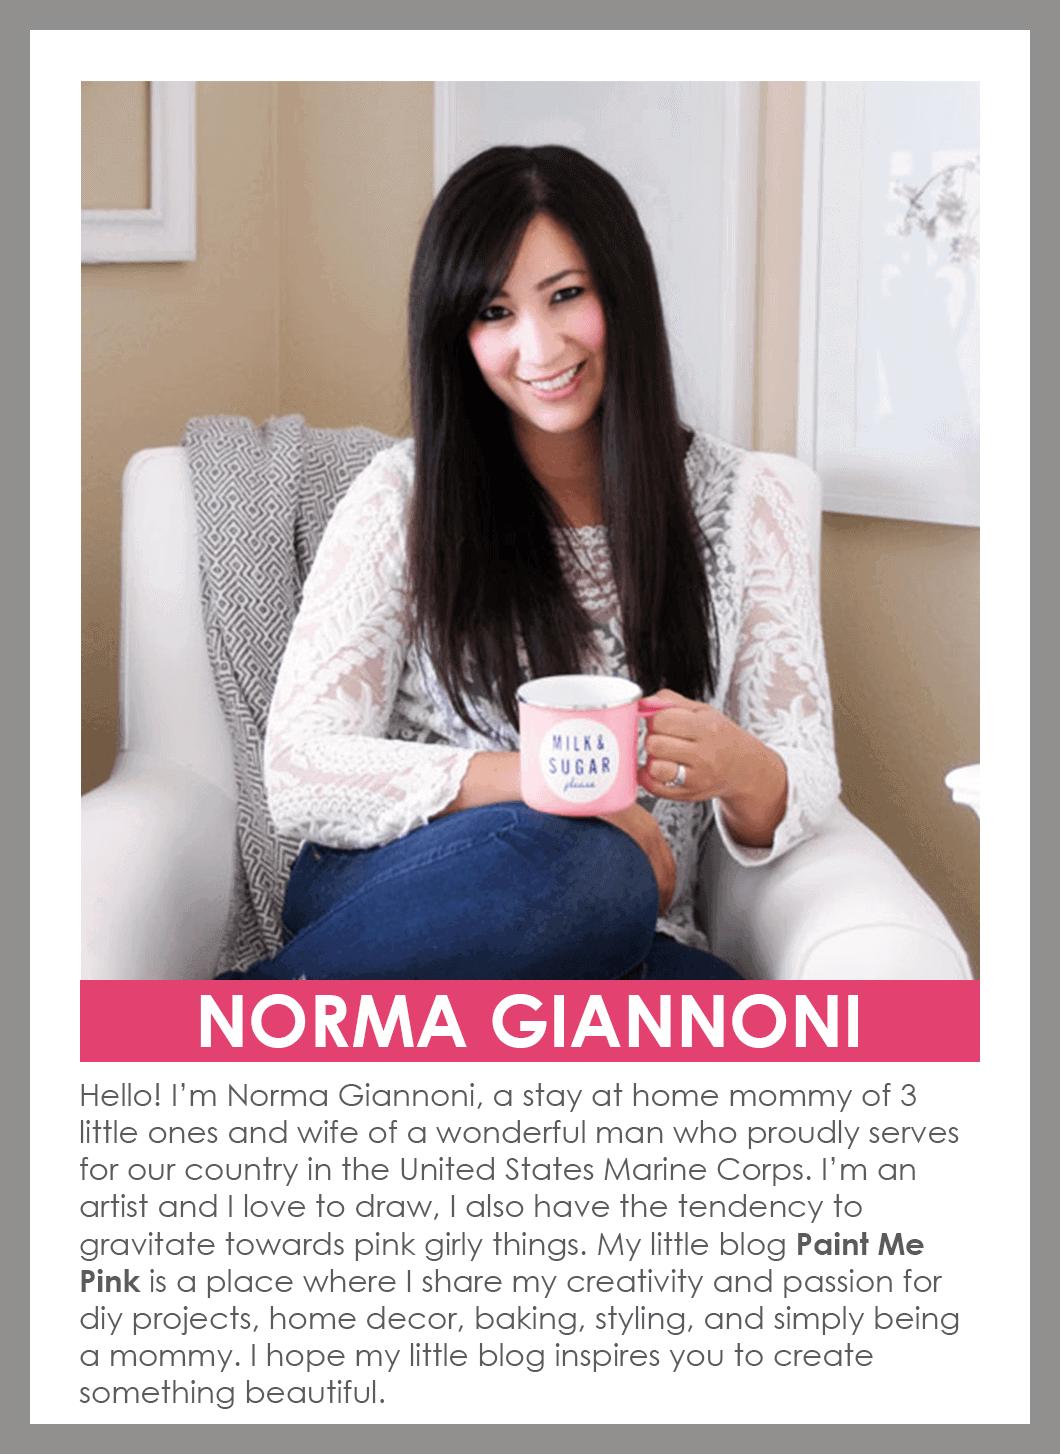 Norma Giannoni